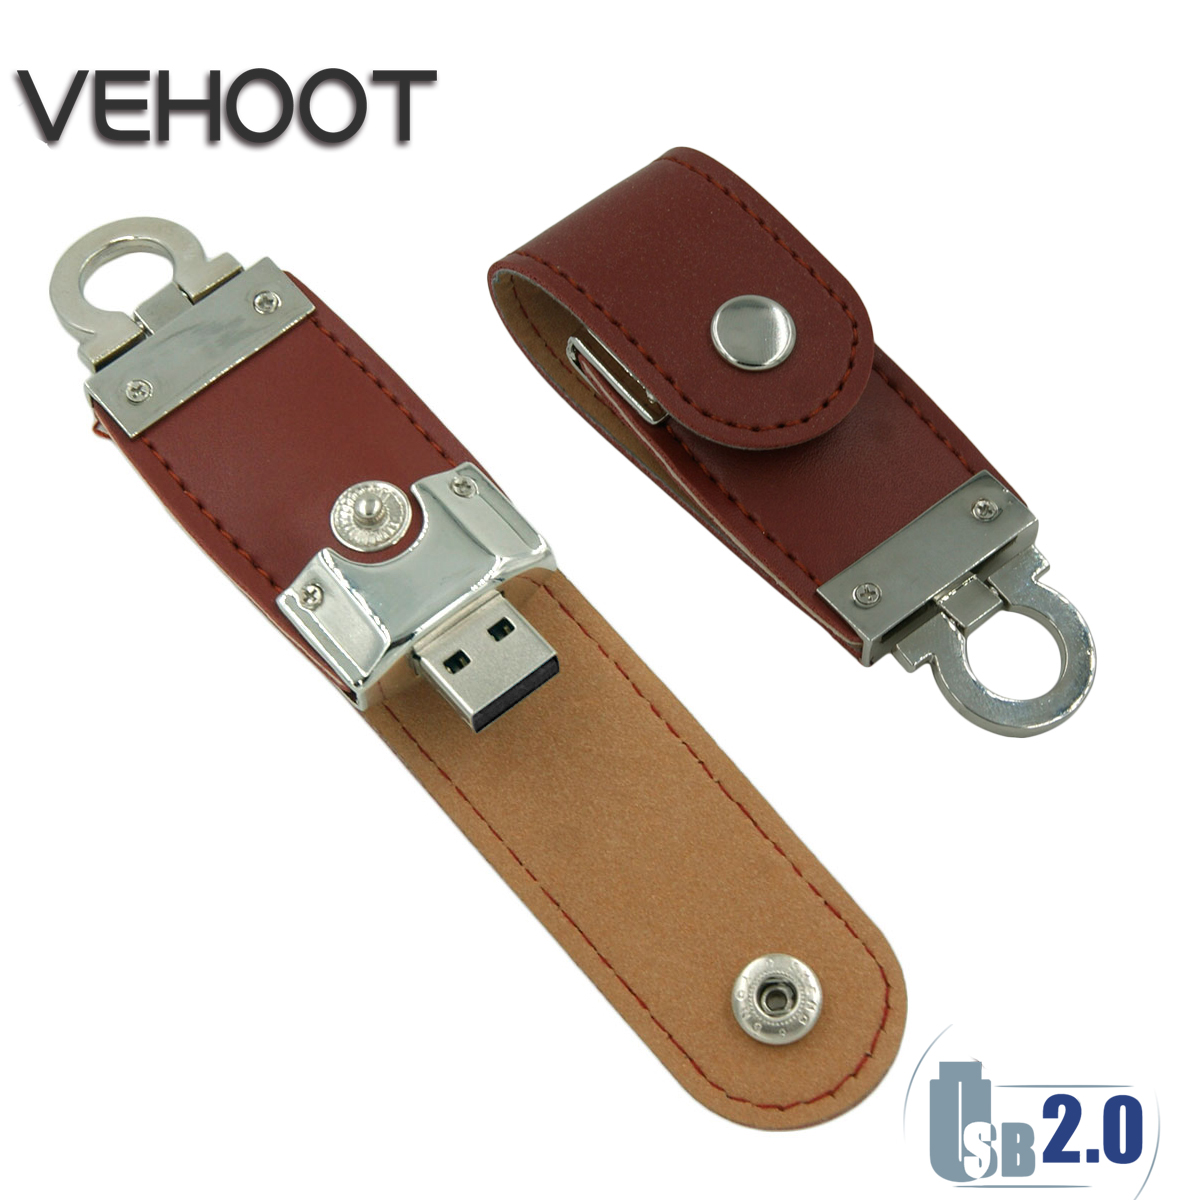 Buy 2016 Wholesale Best Leather Usb Flash Drive 4gb Price Circuit Board 8gb 16gb 32gb 64gb Key Pendrive Memory Stick Pen Vehoot From